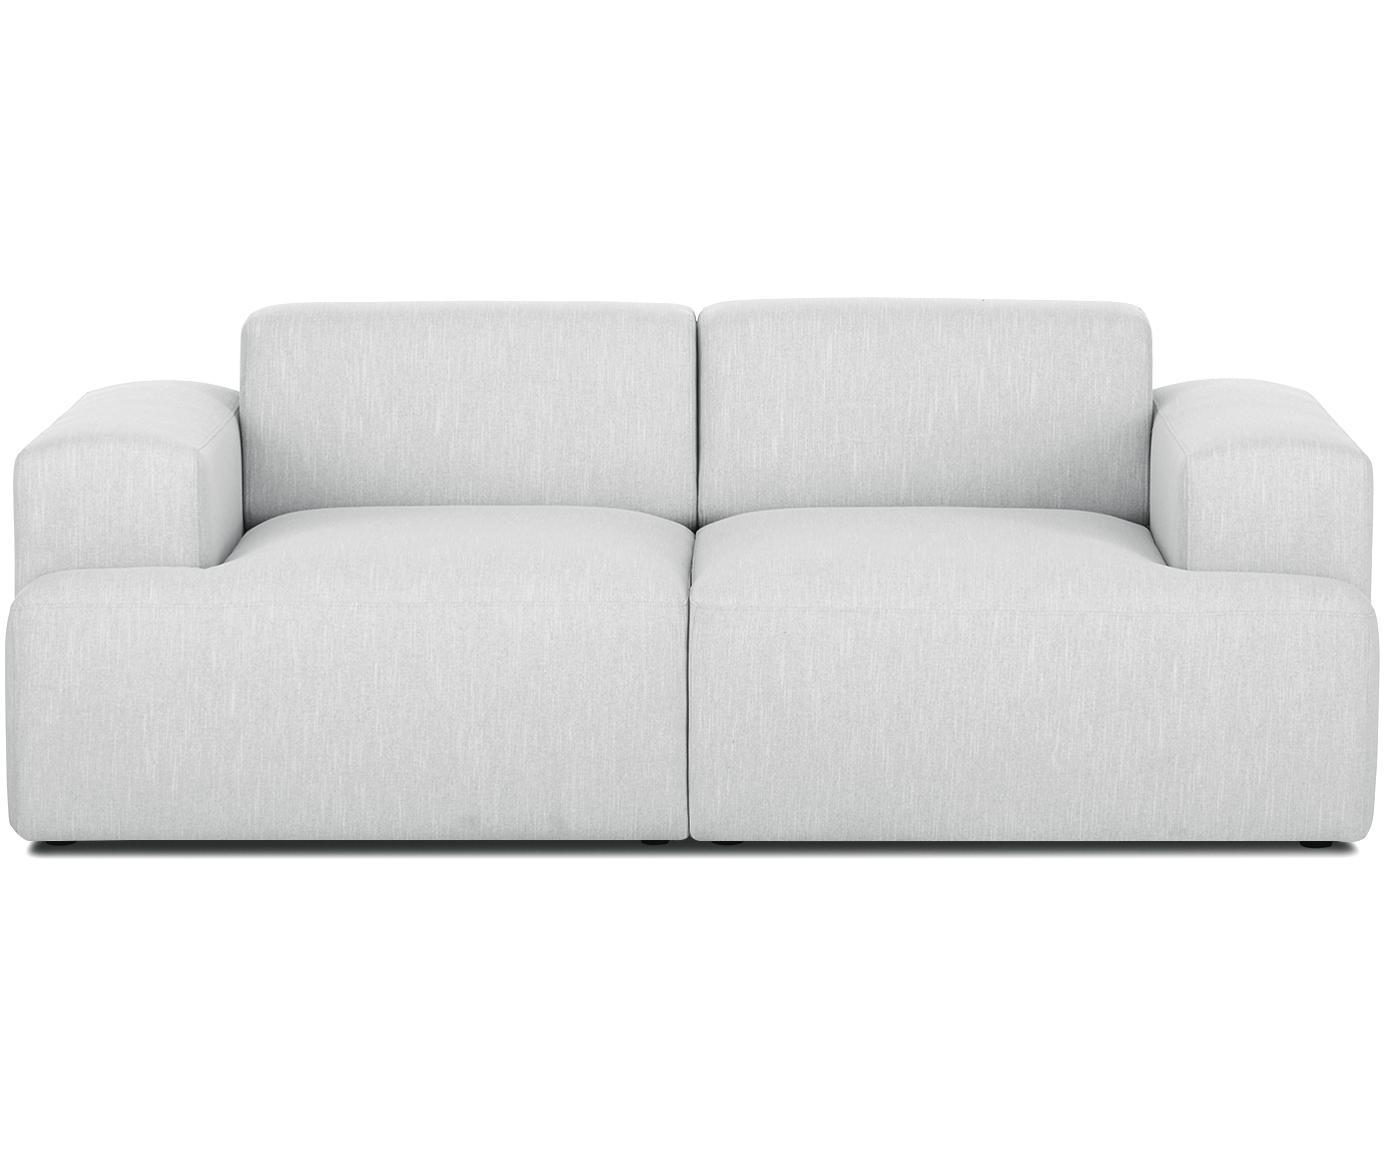 Sofa Melva (2-Sitzer), Bezug: Polyester 35.000 Scheuert, Gestell: Massives Kiefernholz, Spa, Webstoff Hellgrau, B 200 x T 101 cm